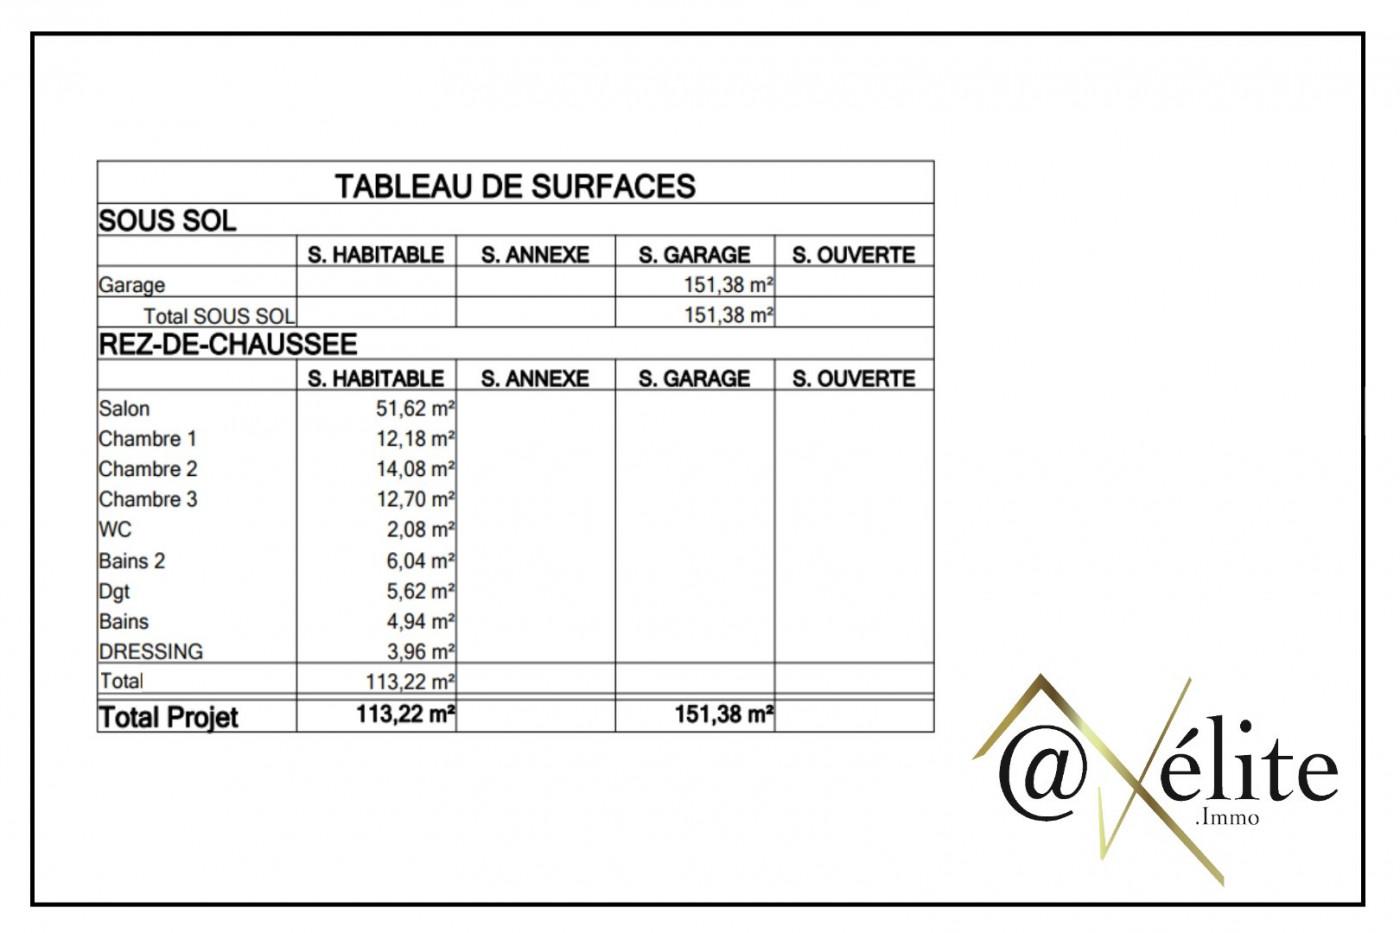 A vendre Chartres 777921554 Axelite sas